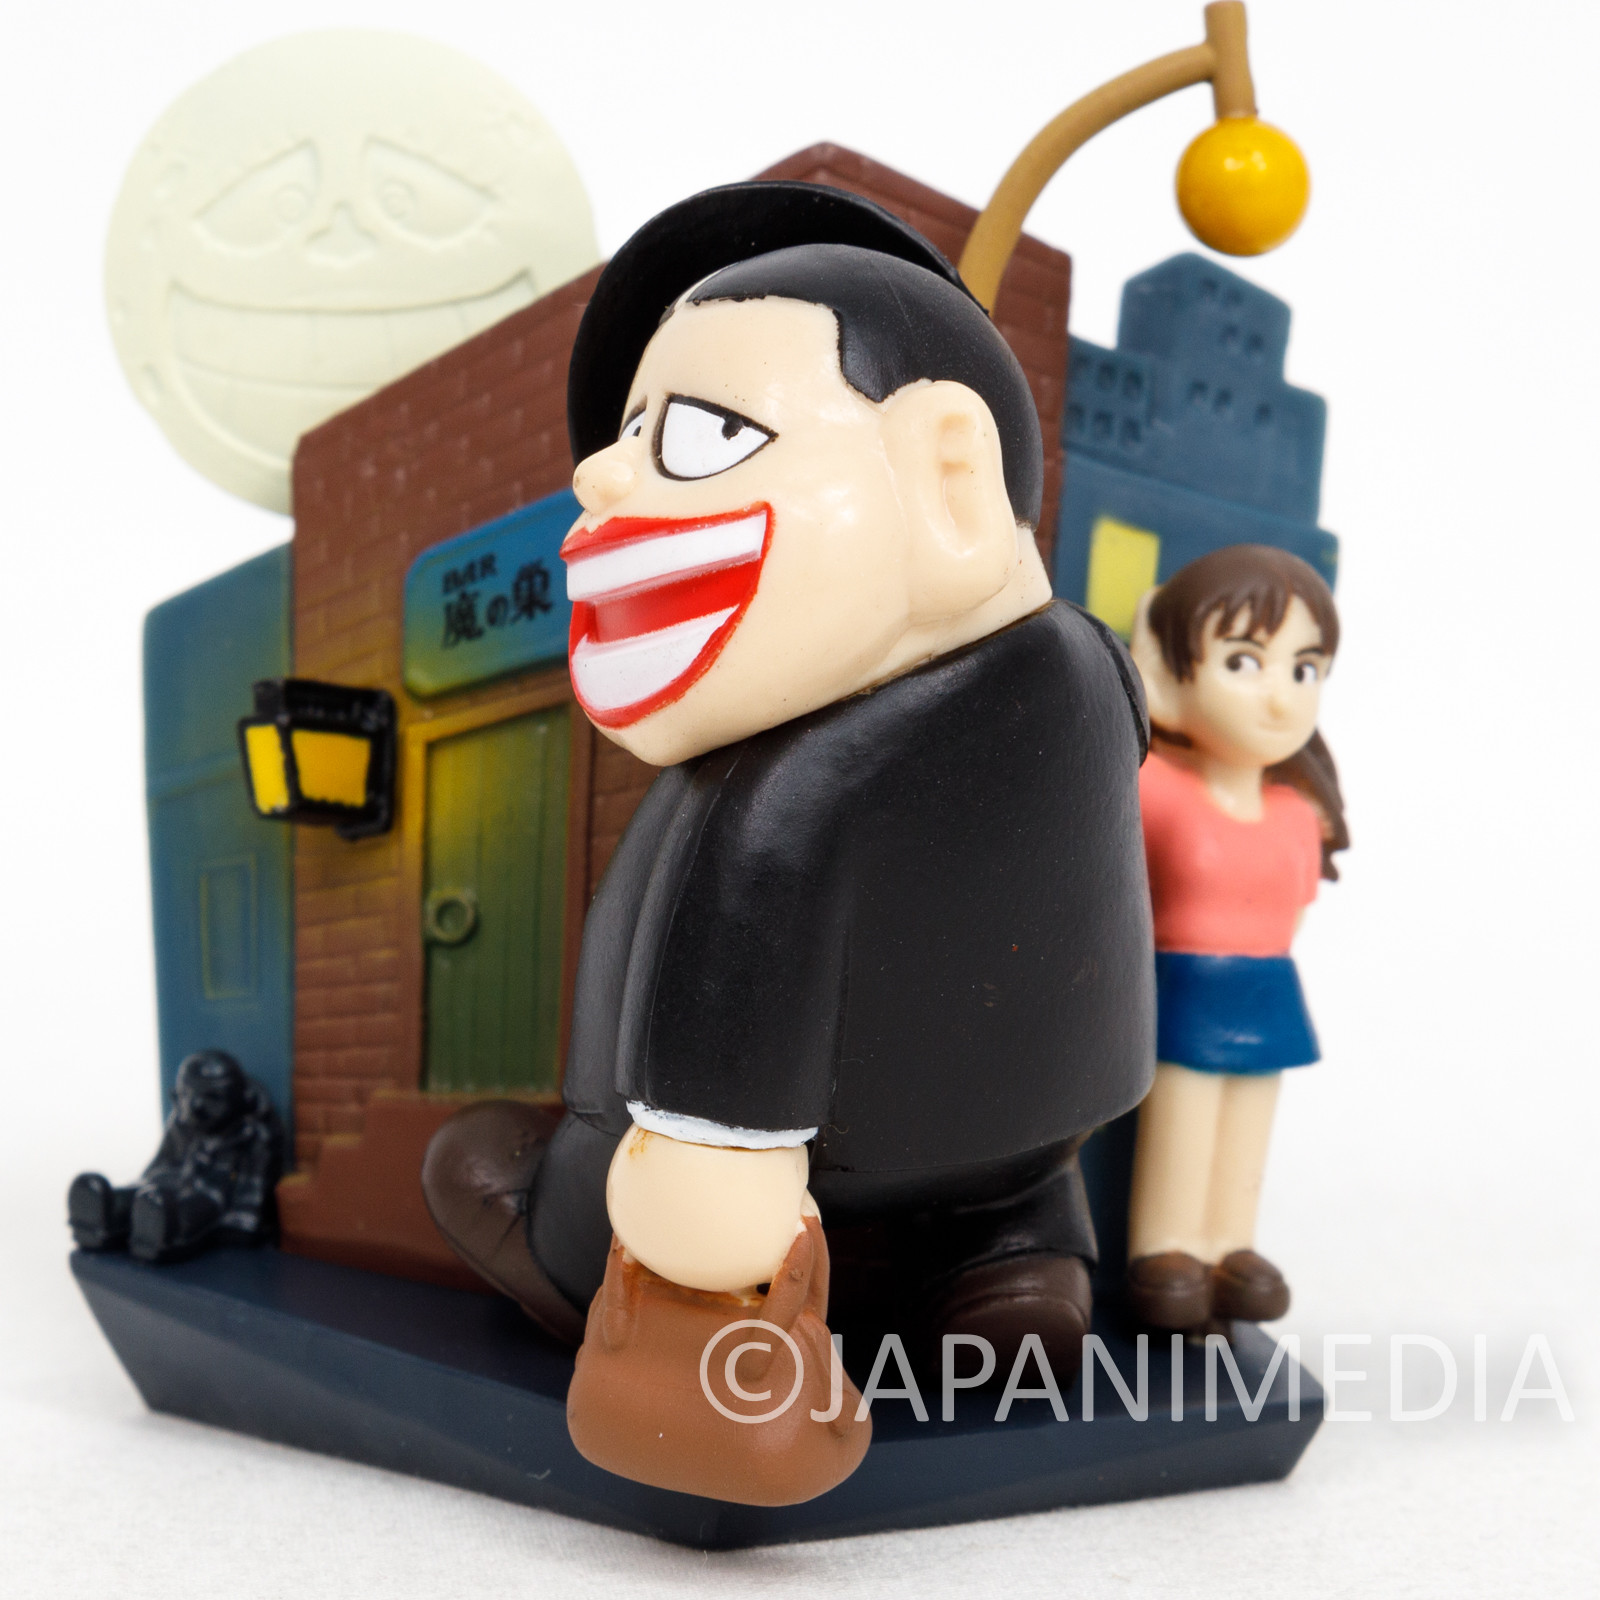 Warau Laughing Salesman Diorama Fukuzo Moguro Miniature Figure JAPAN ANIME 5